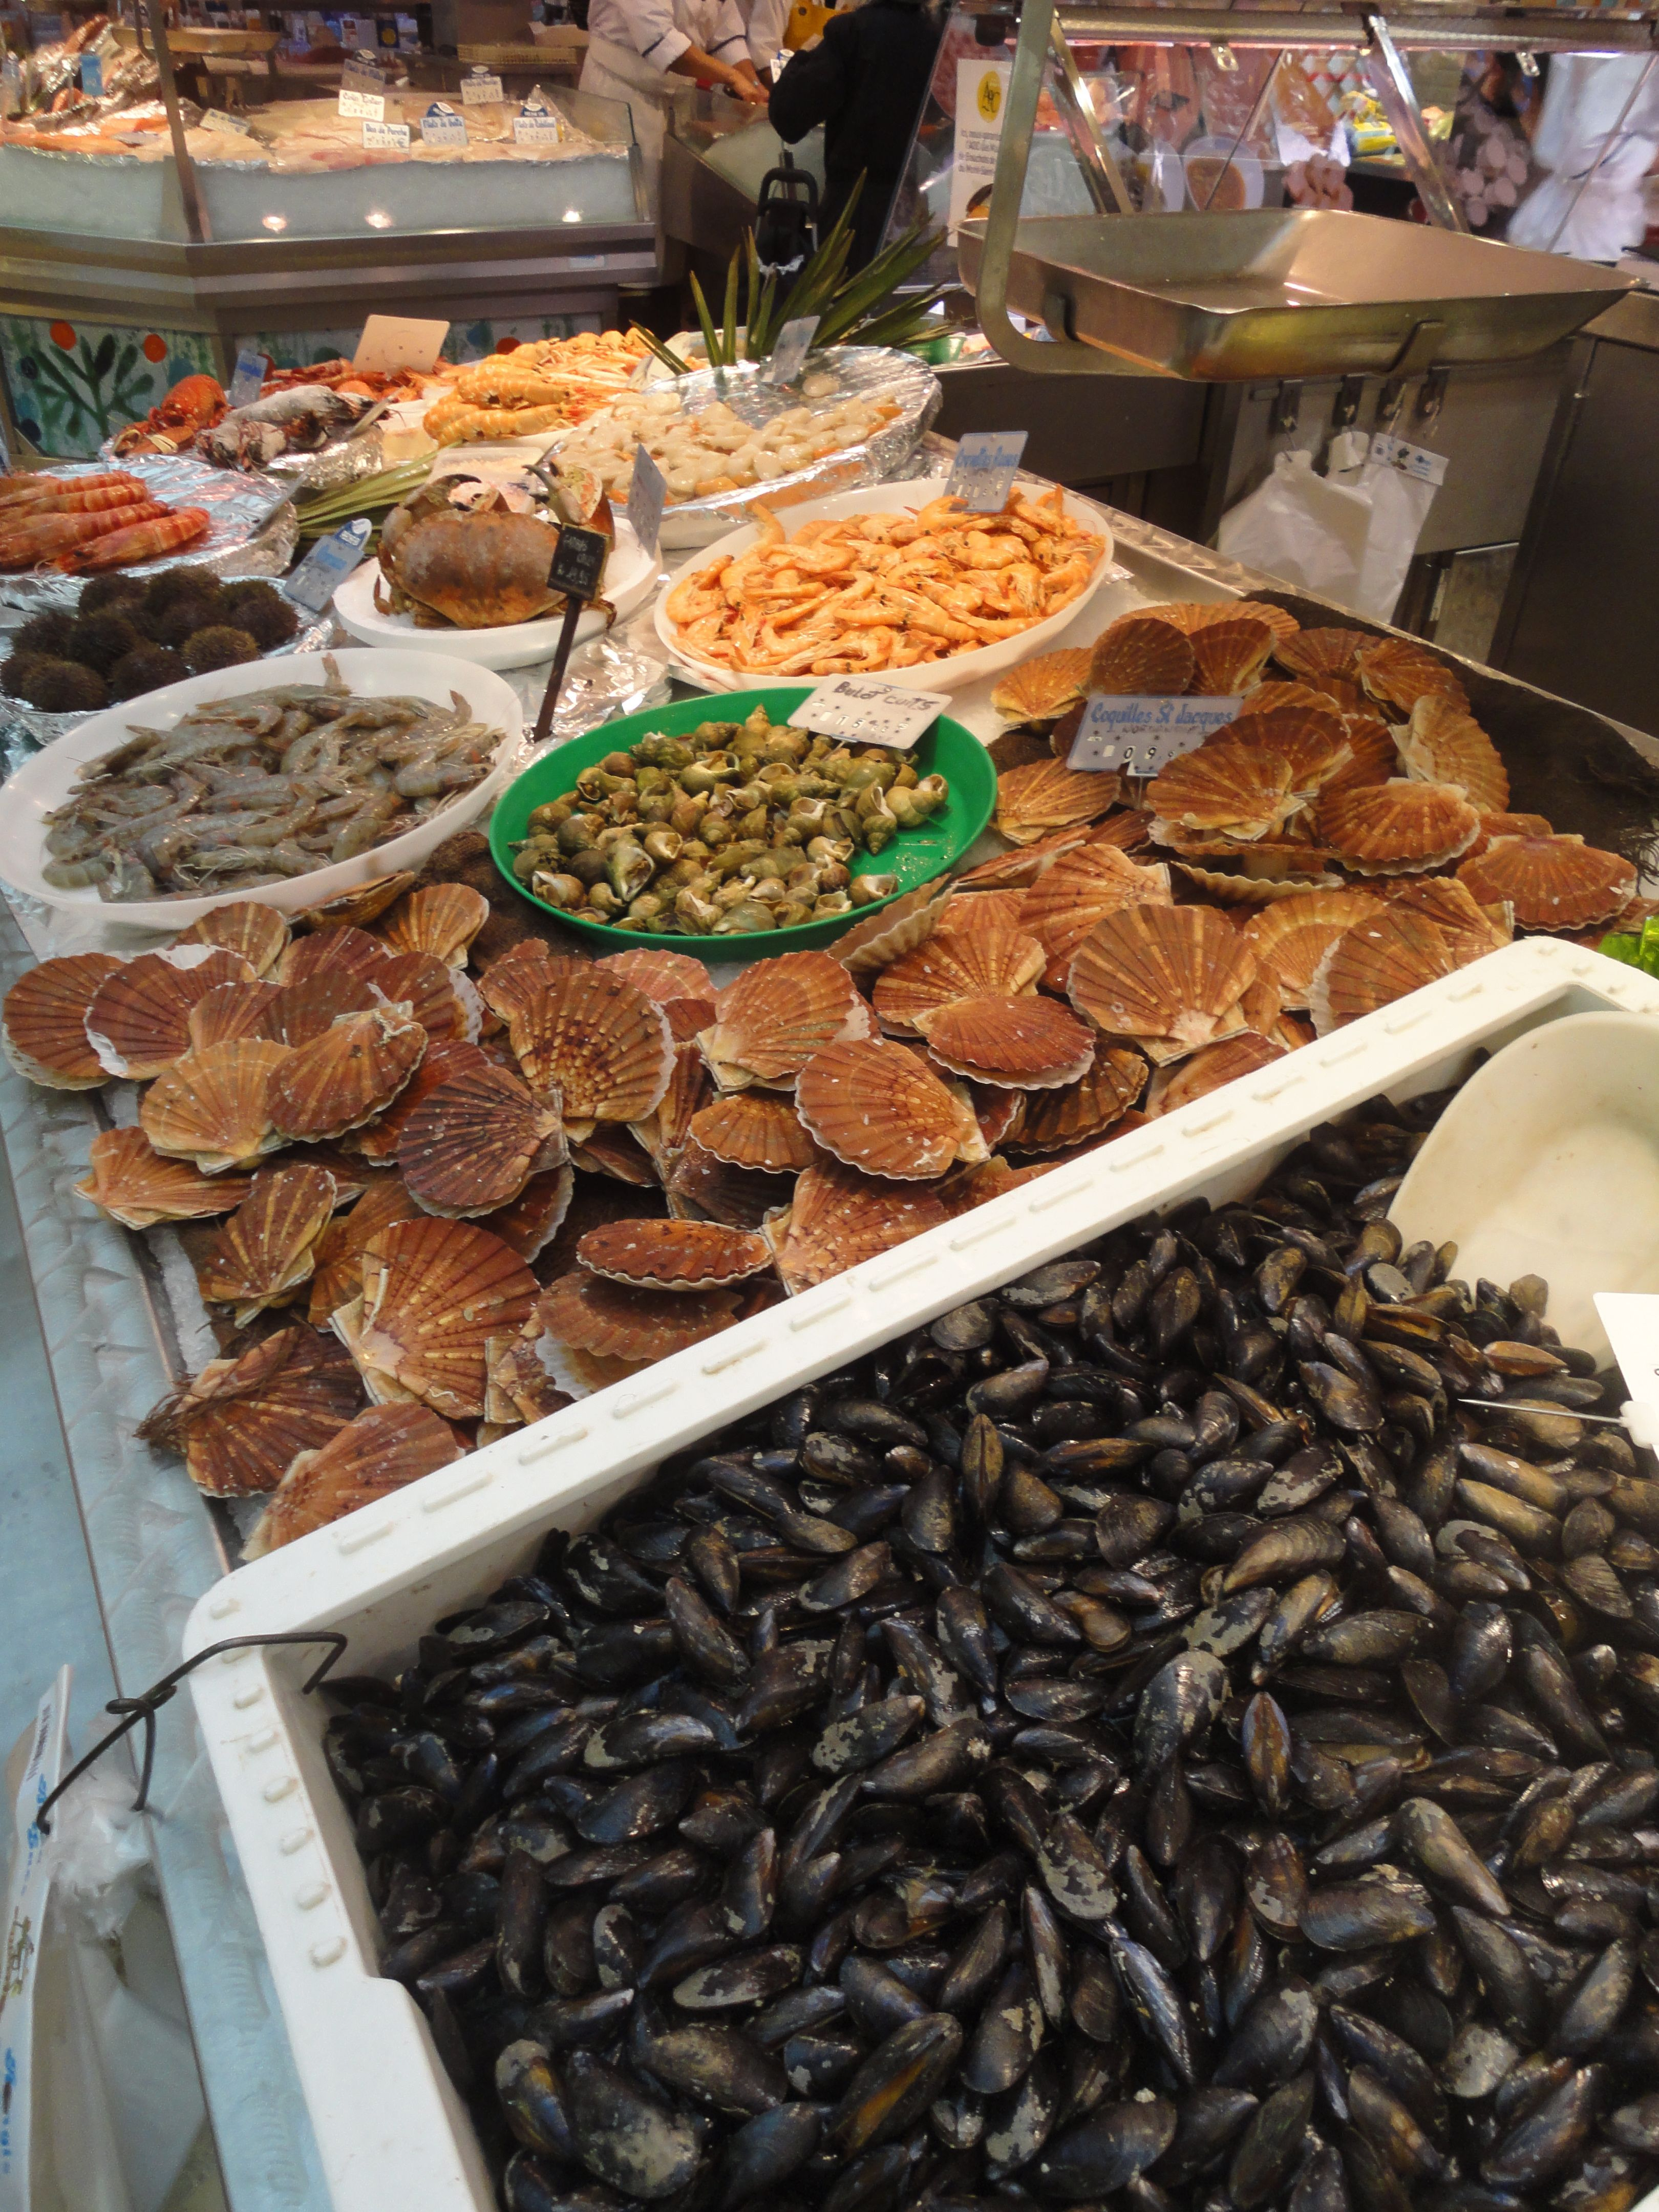 Seafood market foods pinterest seafood market for Closest fish market